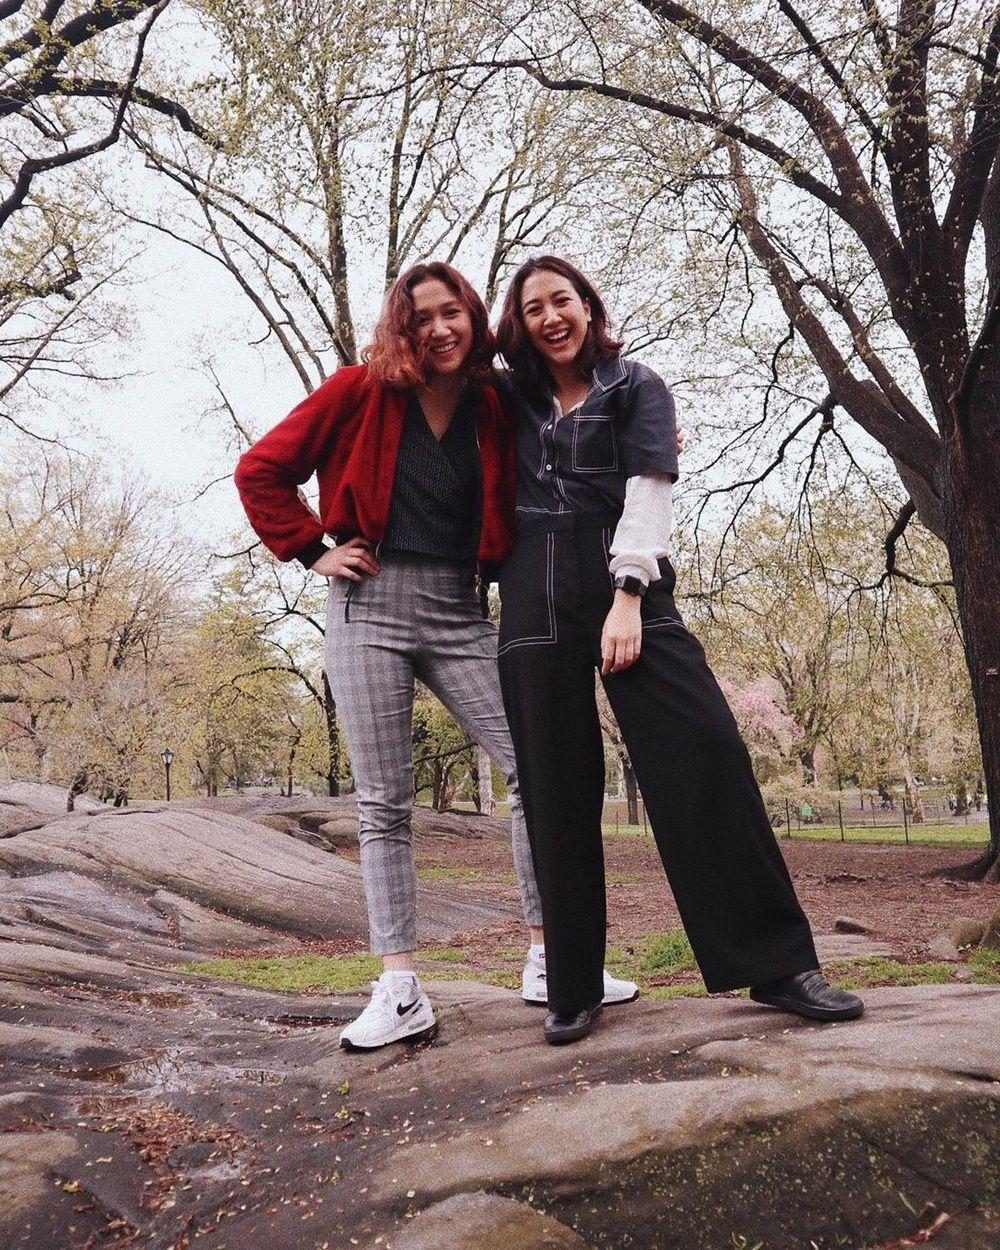 9 Potret Kompak Sherina Munaf dan Adiknya, Mirip Bak Saudara Kembar